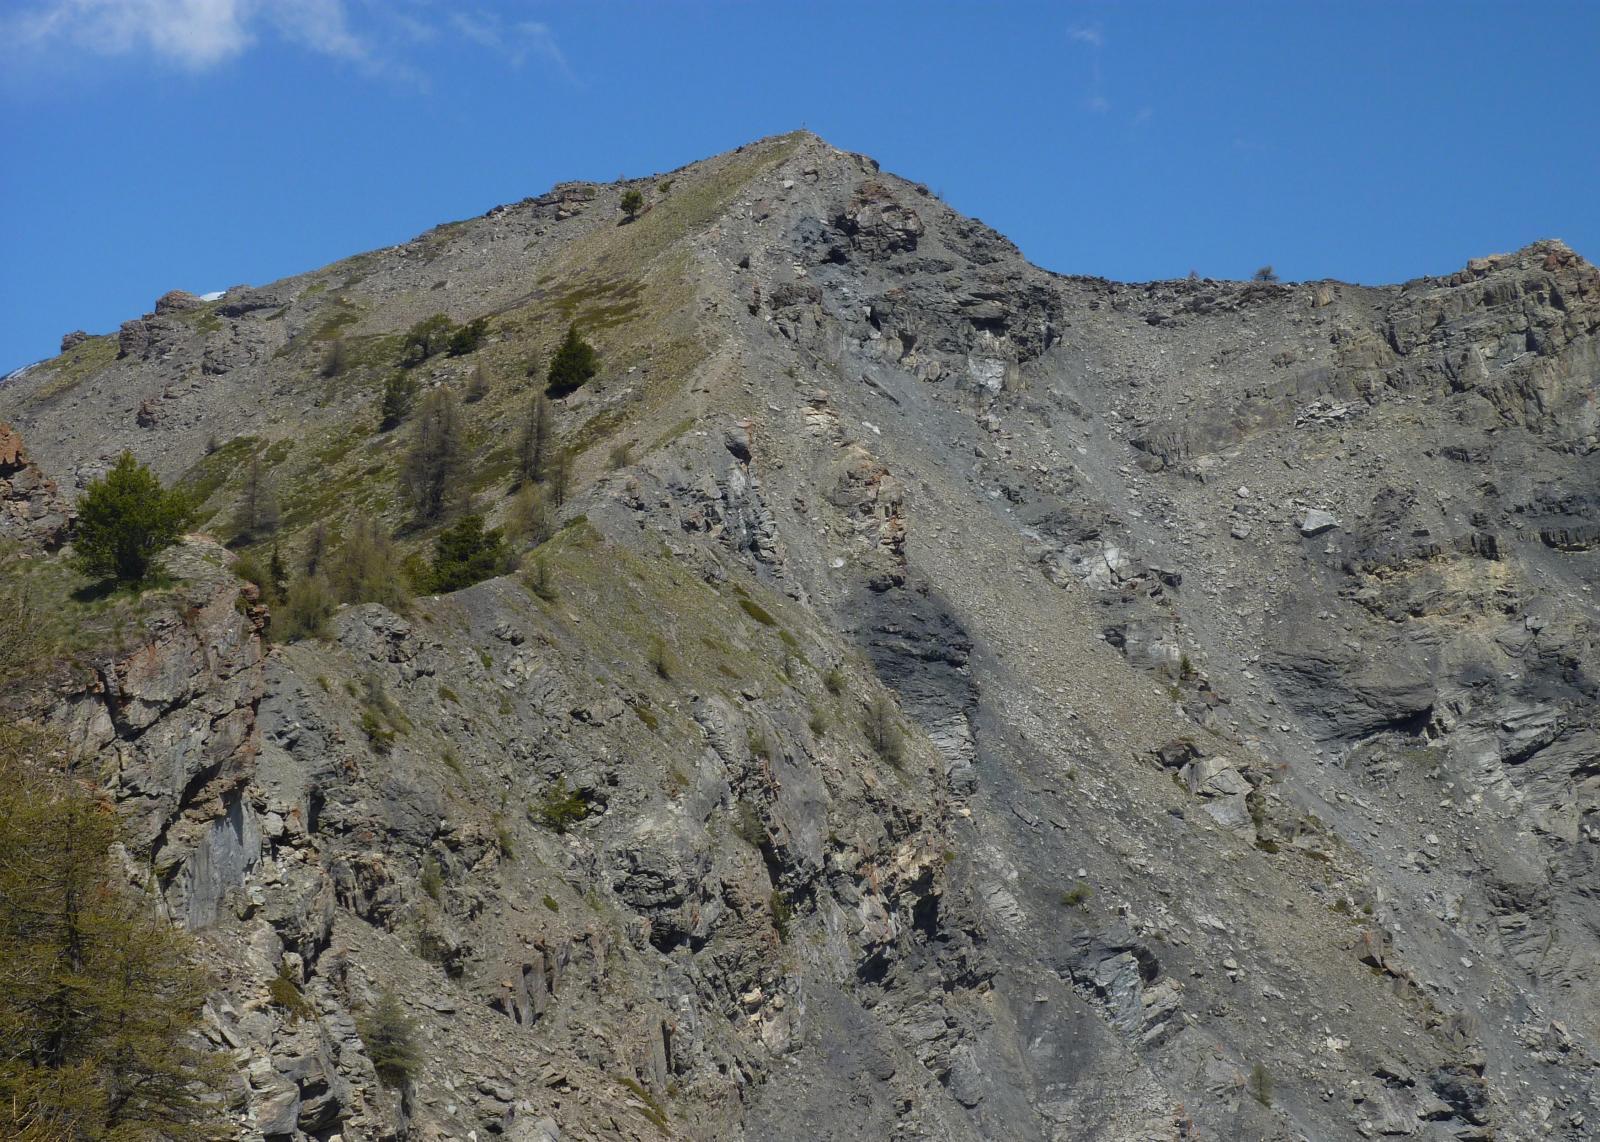 Cresta di salita da Bellon